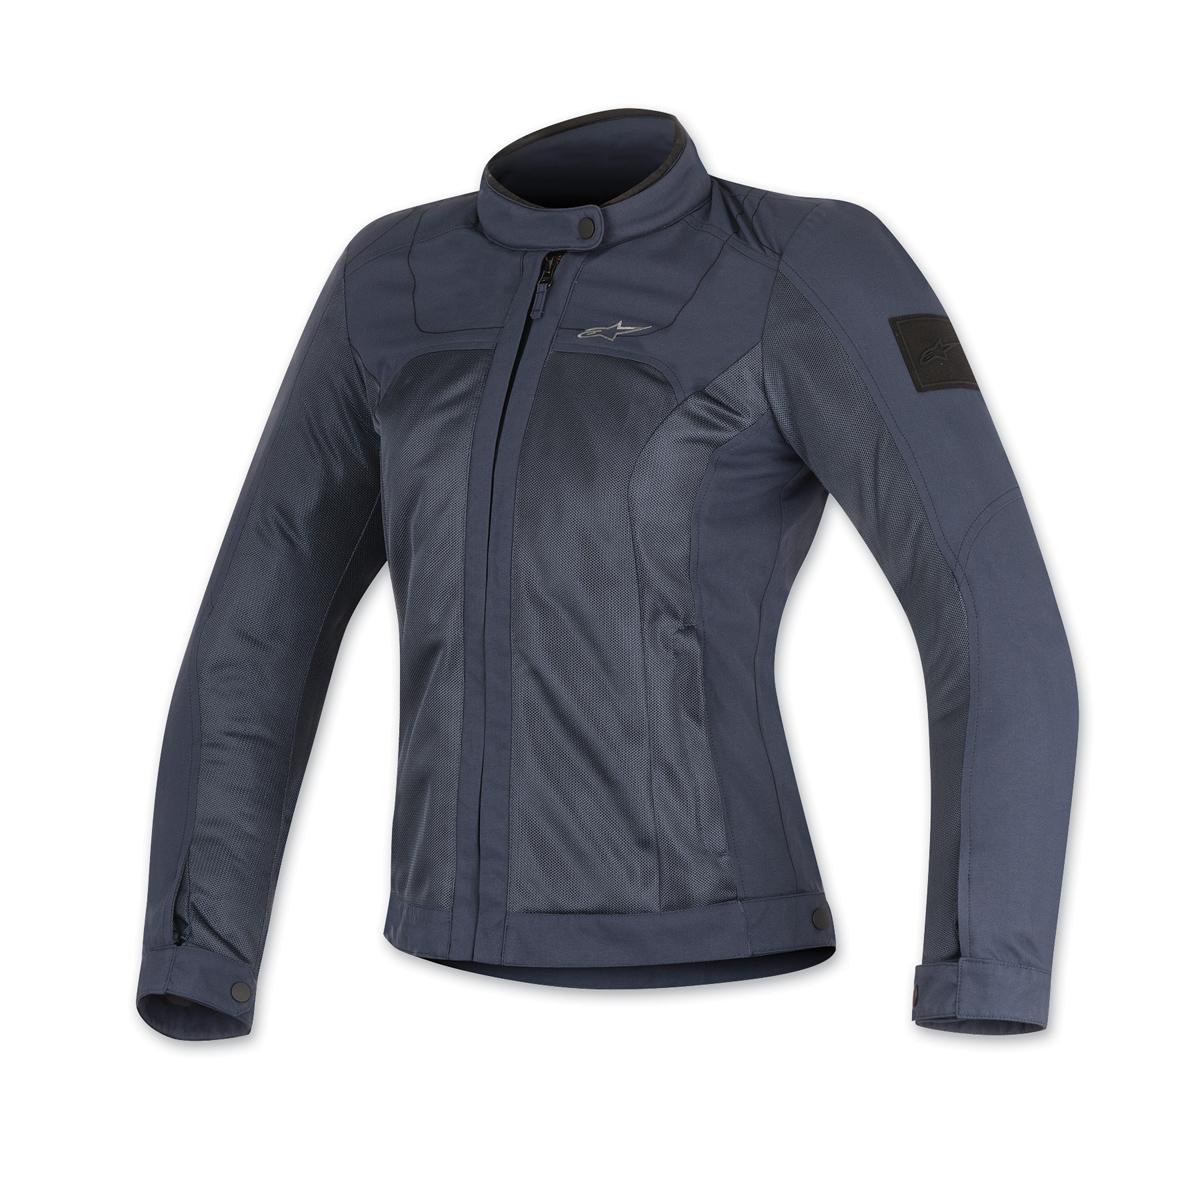 Alpinestars Women's Eloise Air Indigo Jacket